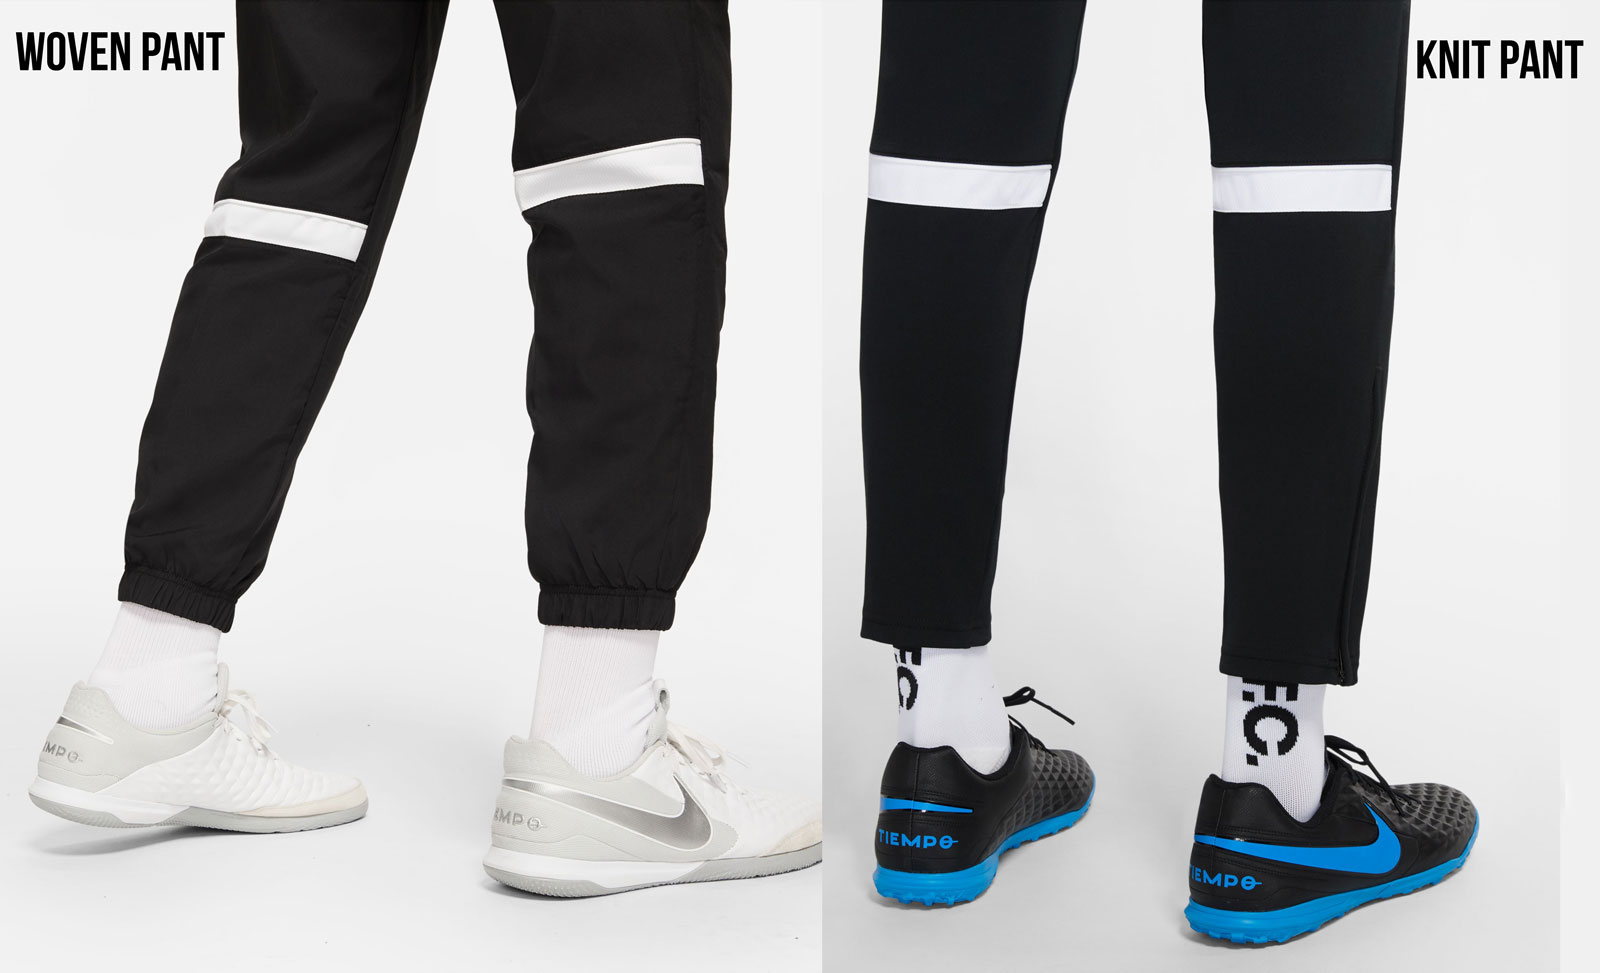 das Beinende der Nike Trainingshosen (Woven Pant und Knit Pant)